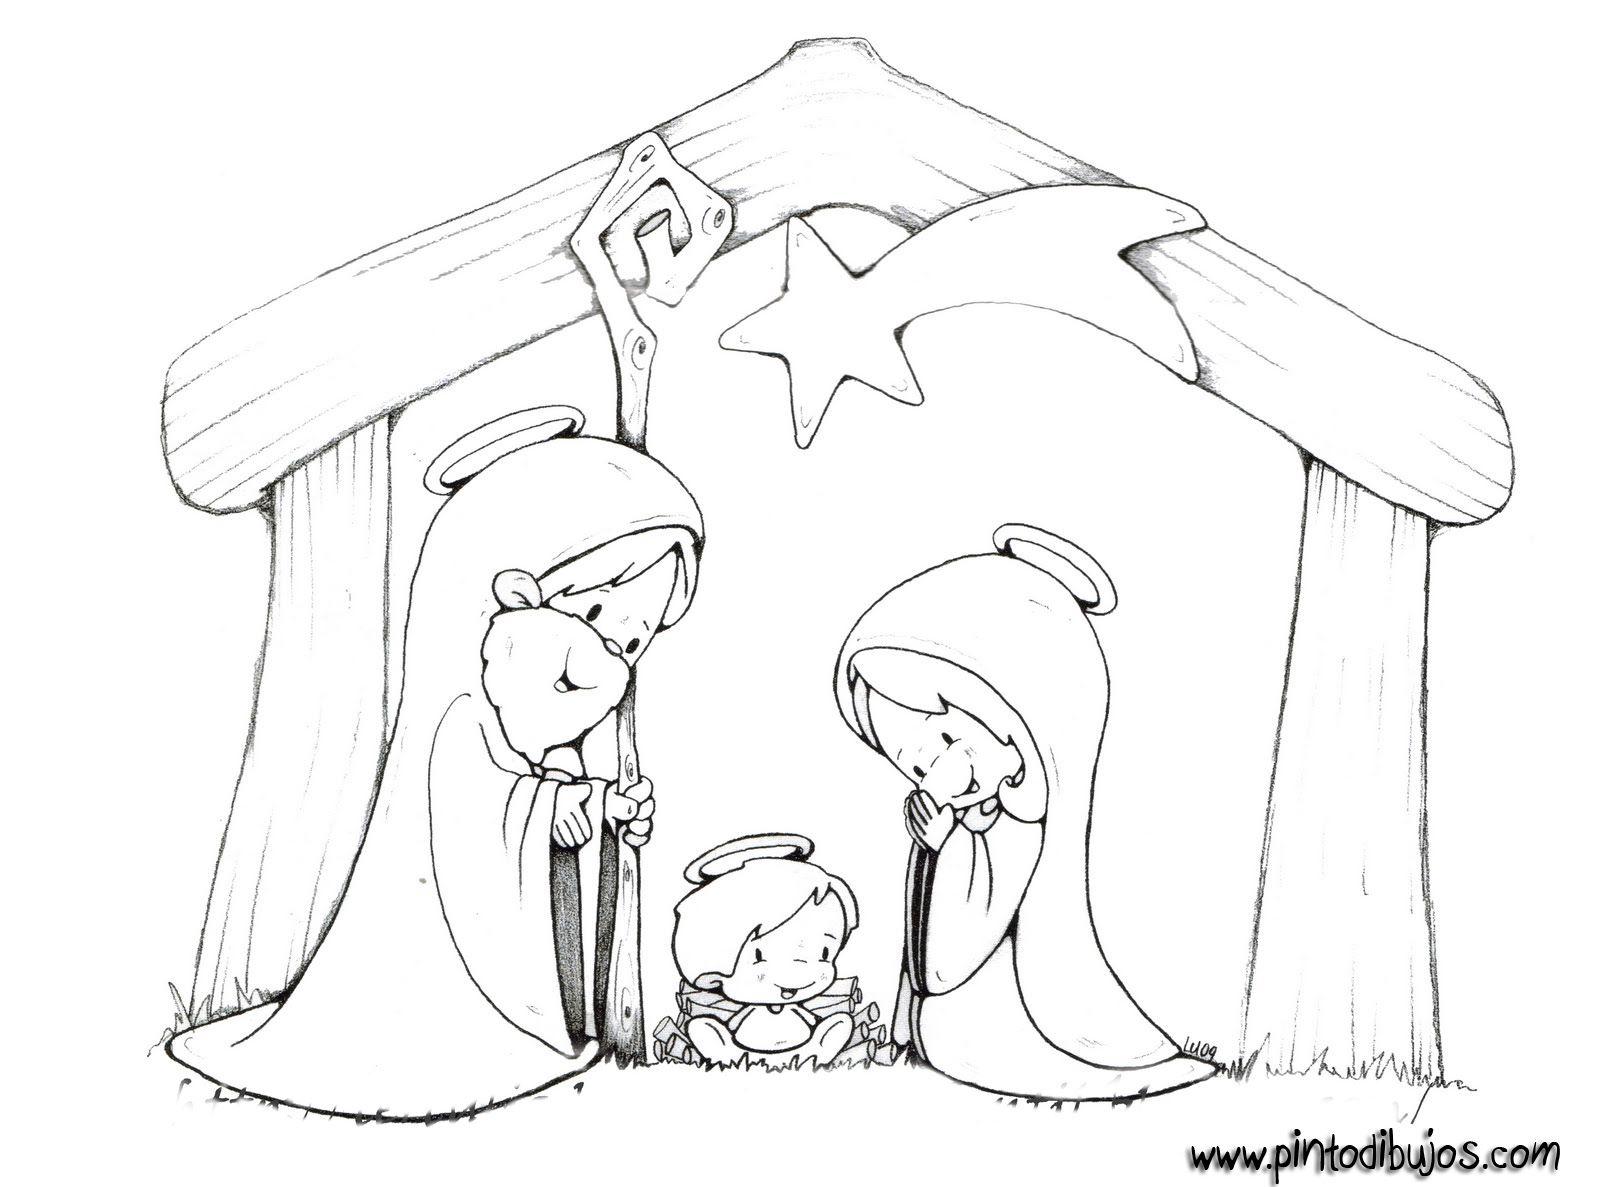 d96690af2ca Belen Navidad Para Colorear - Belen Navidad Para Colorear Az Dibujos ...